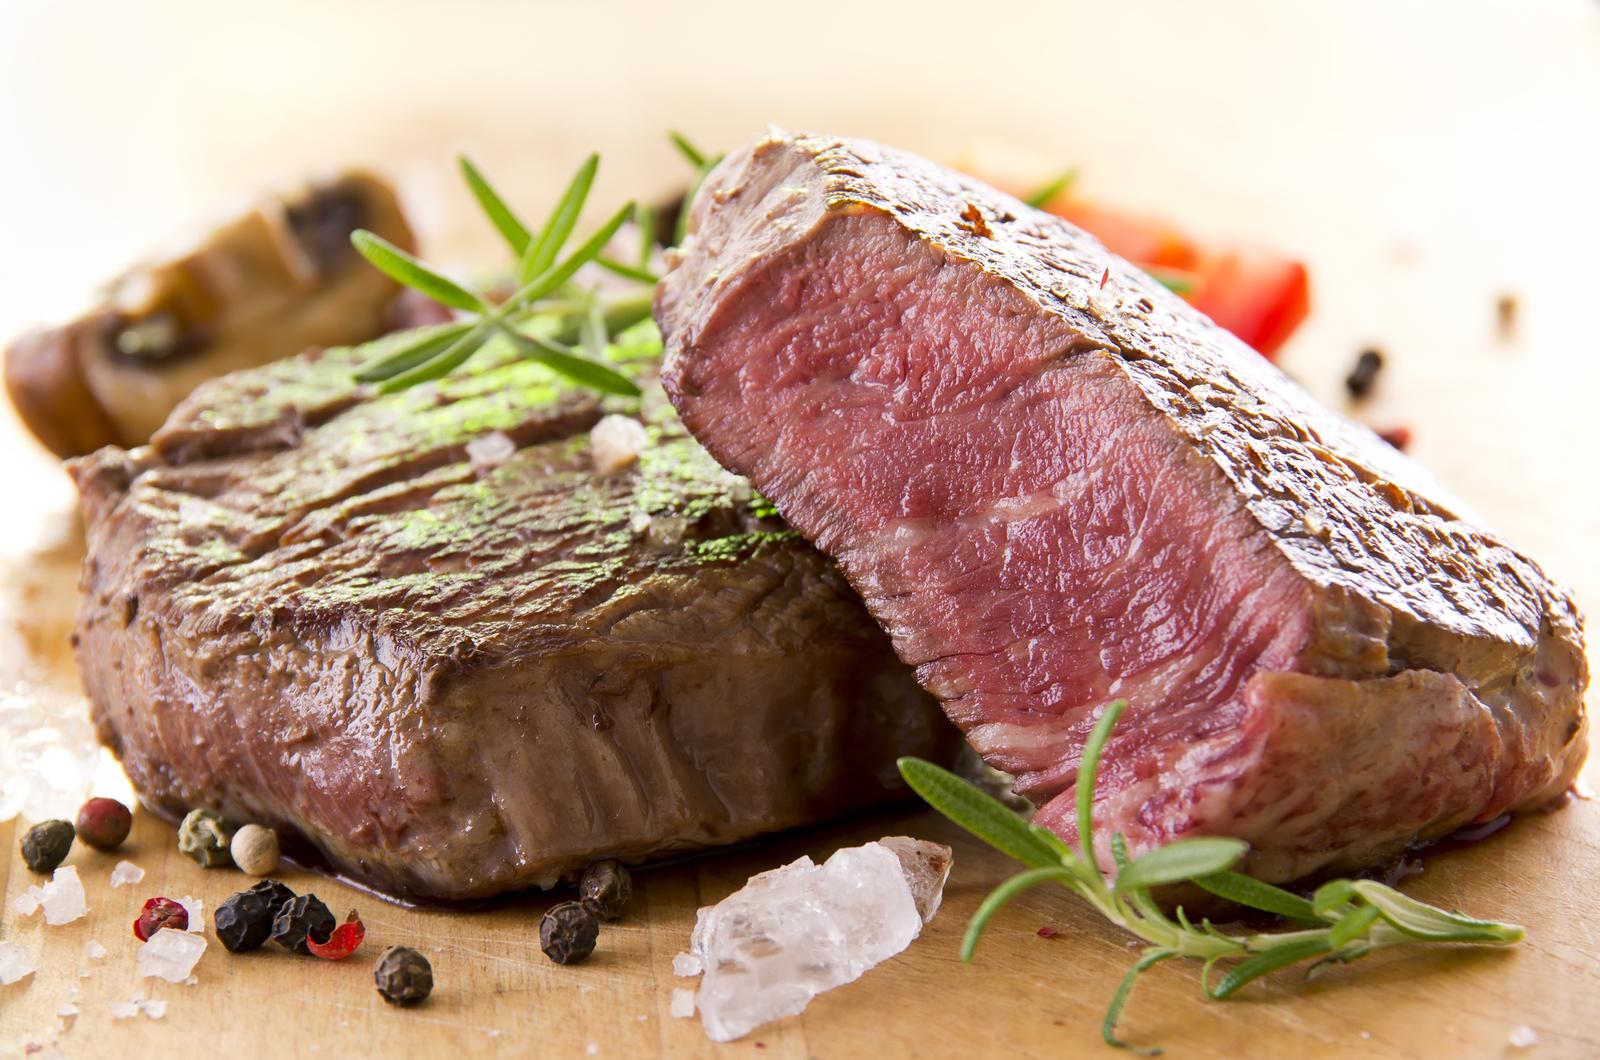 bigstock-beef-steak-with-herbs-41076253.jpg